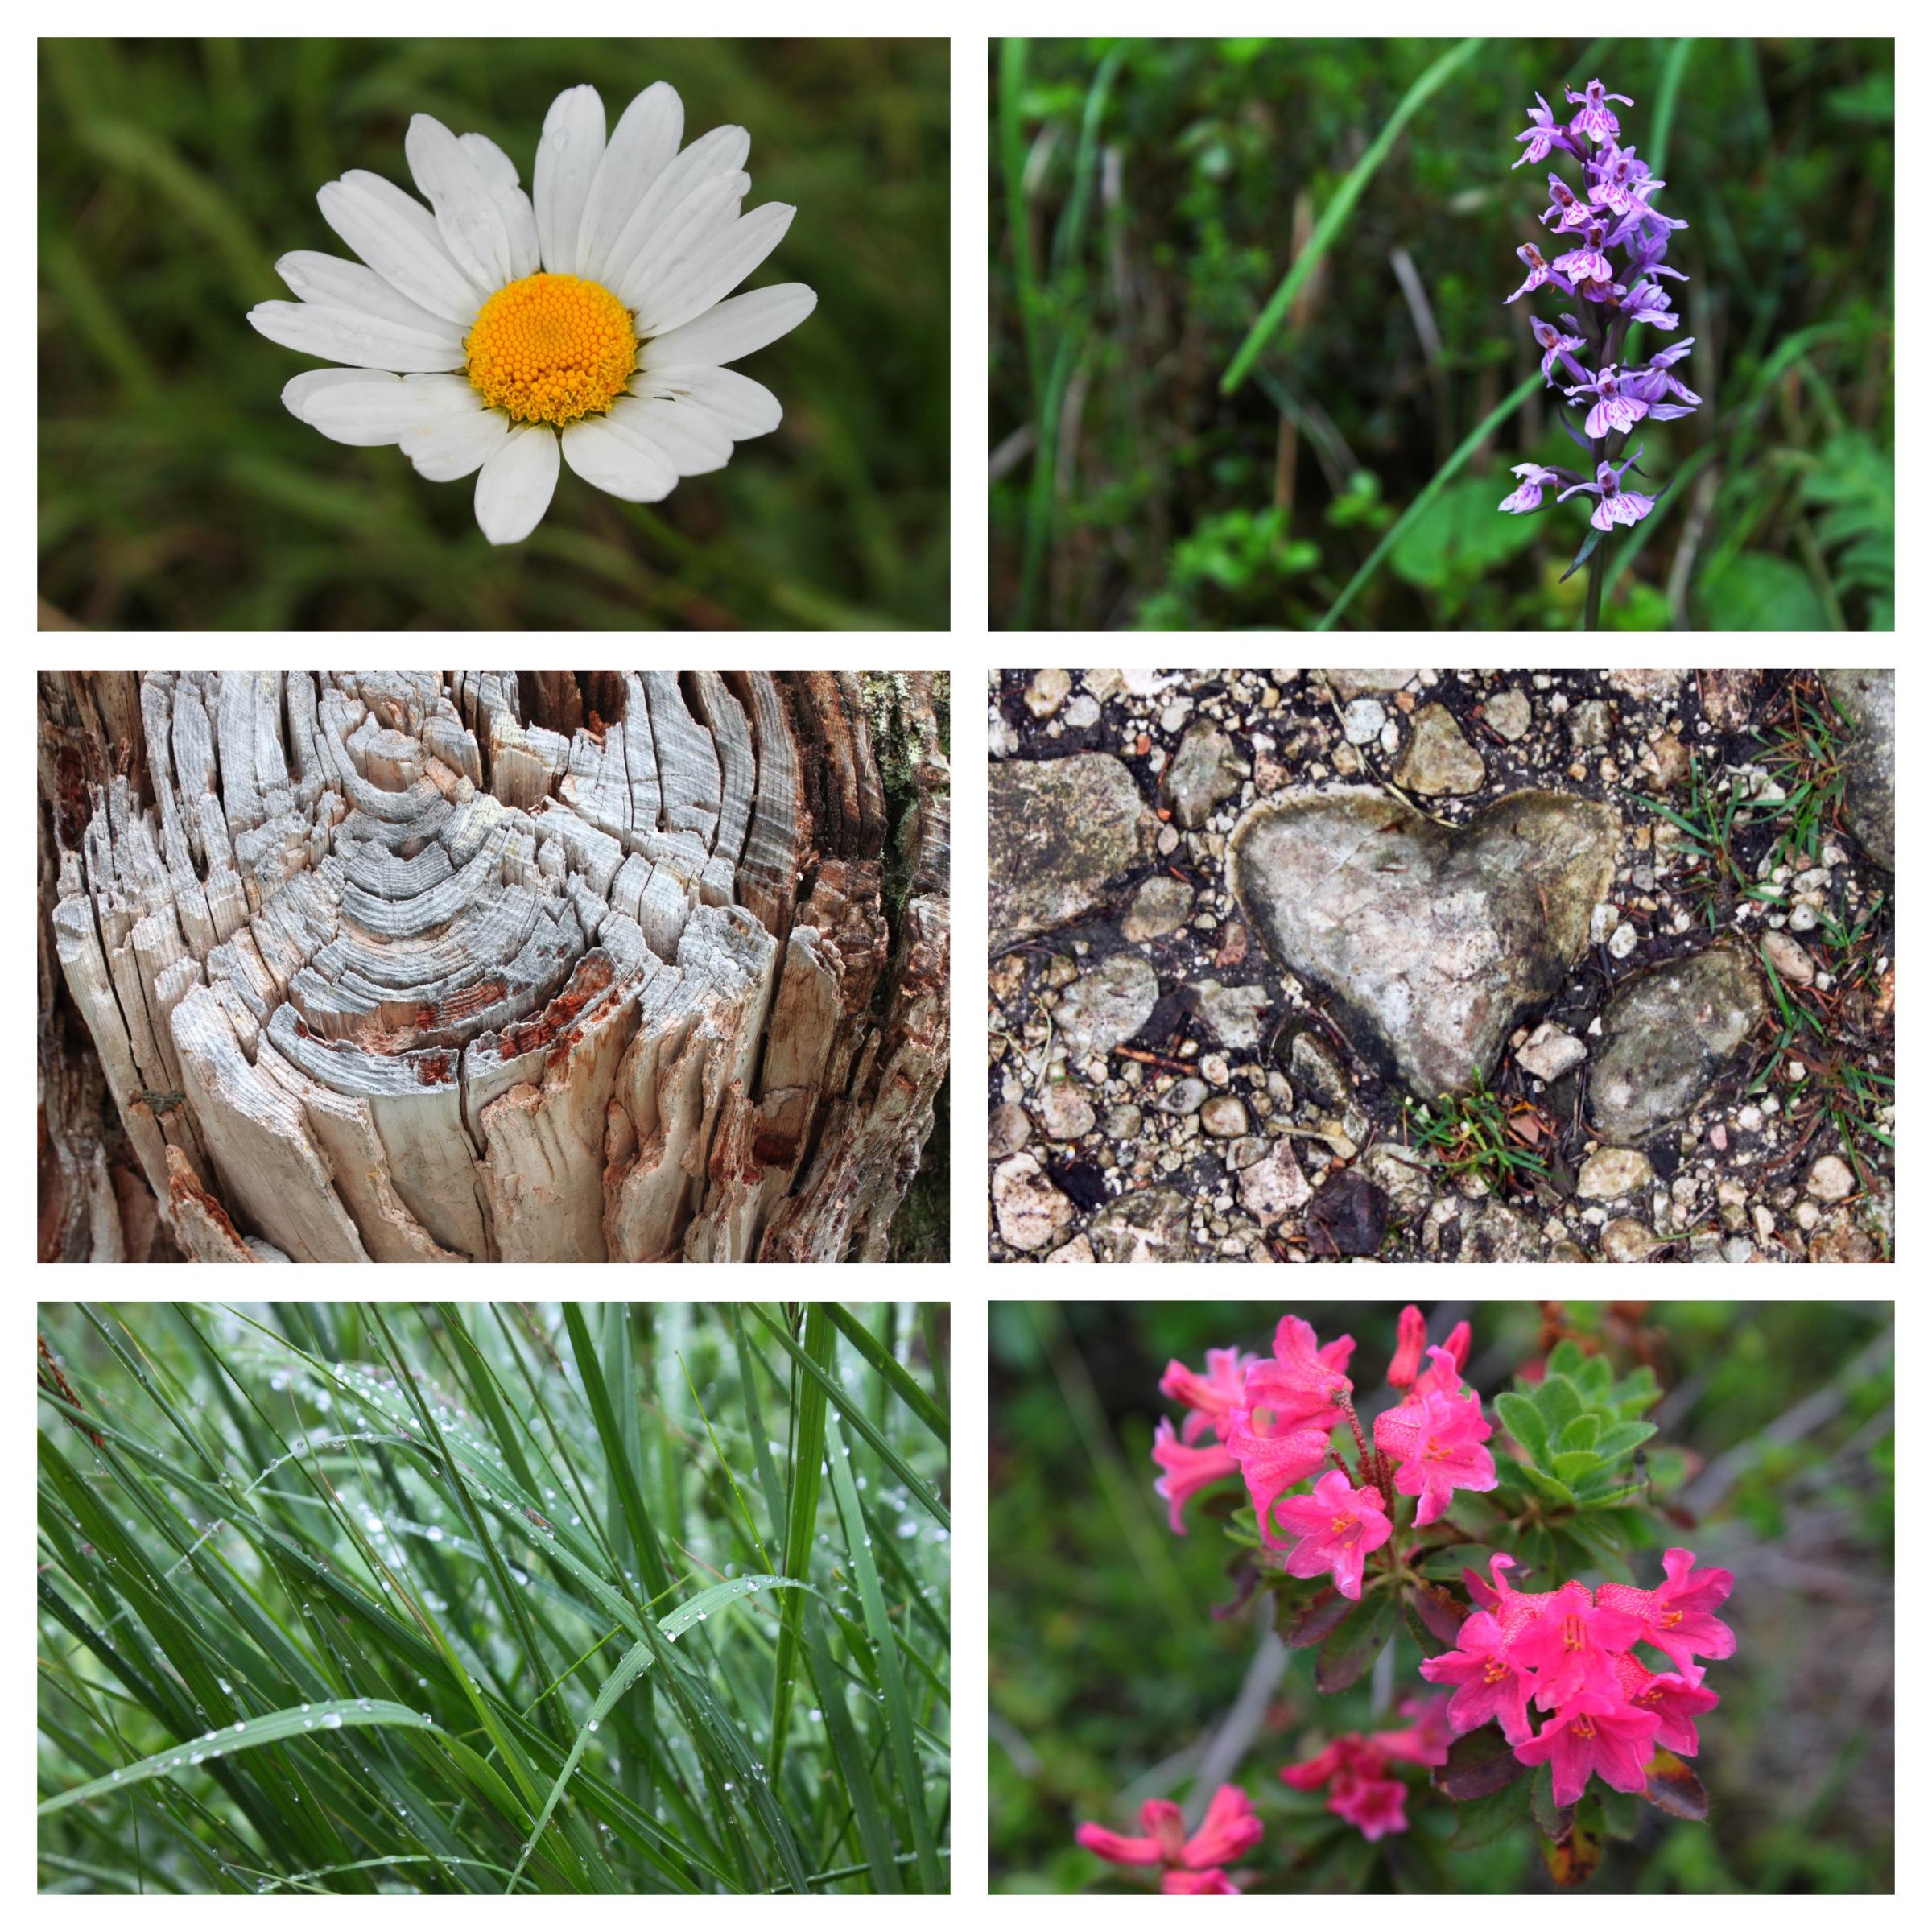 fiori cortina d'ampezzo hiking trip